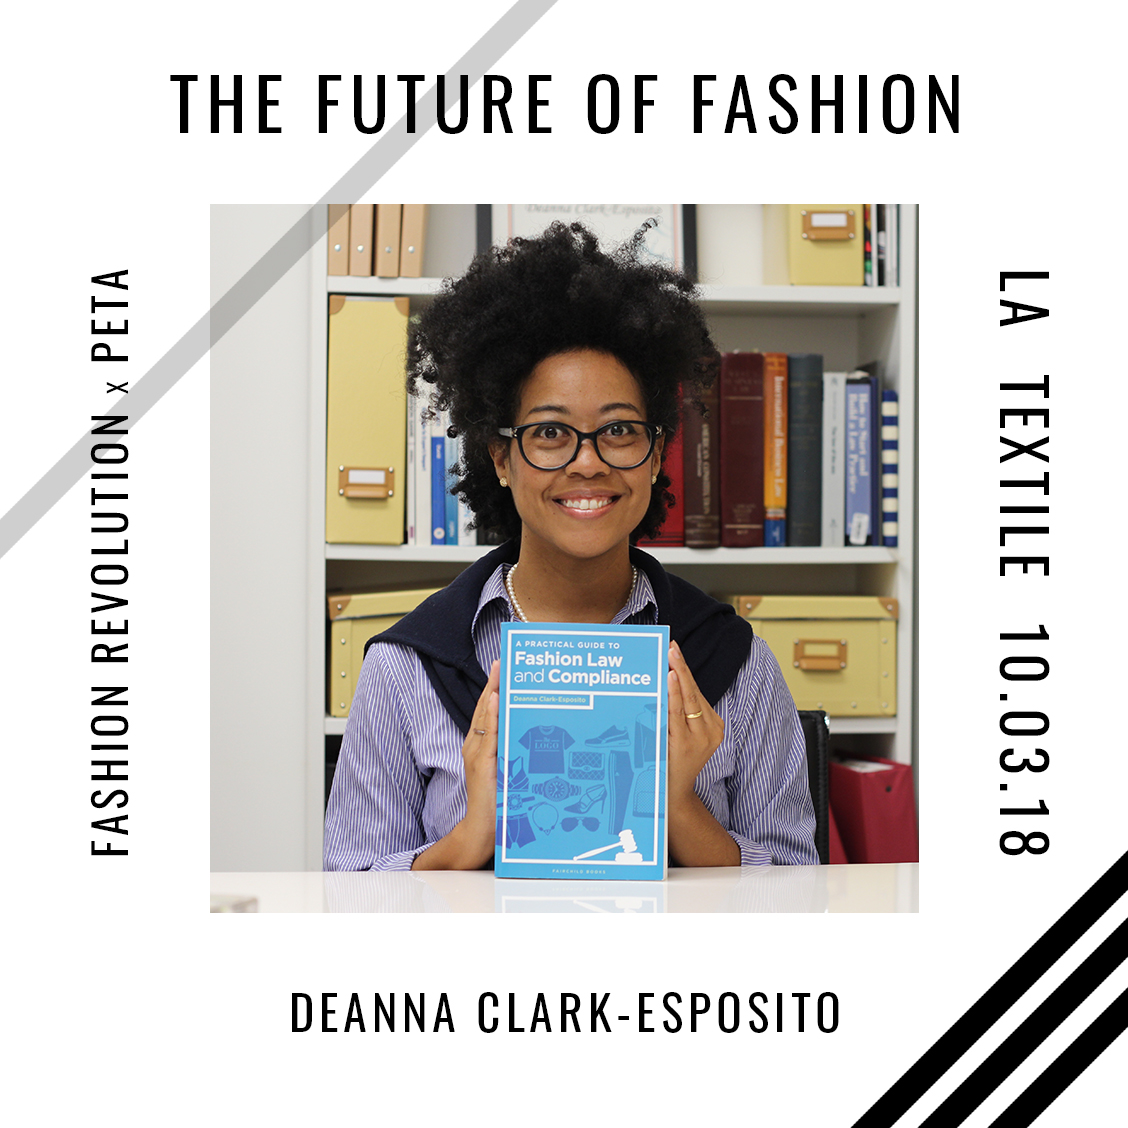 TFOF_Deanna Clark-Esposito.jpg